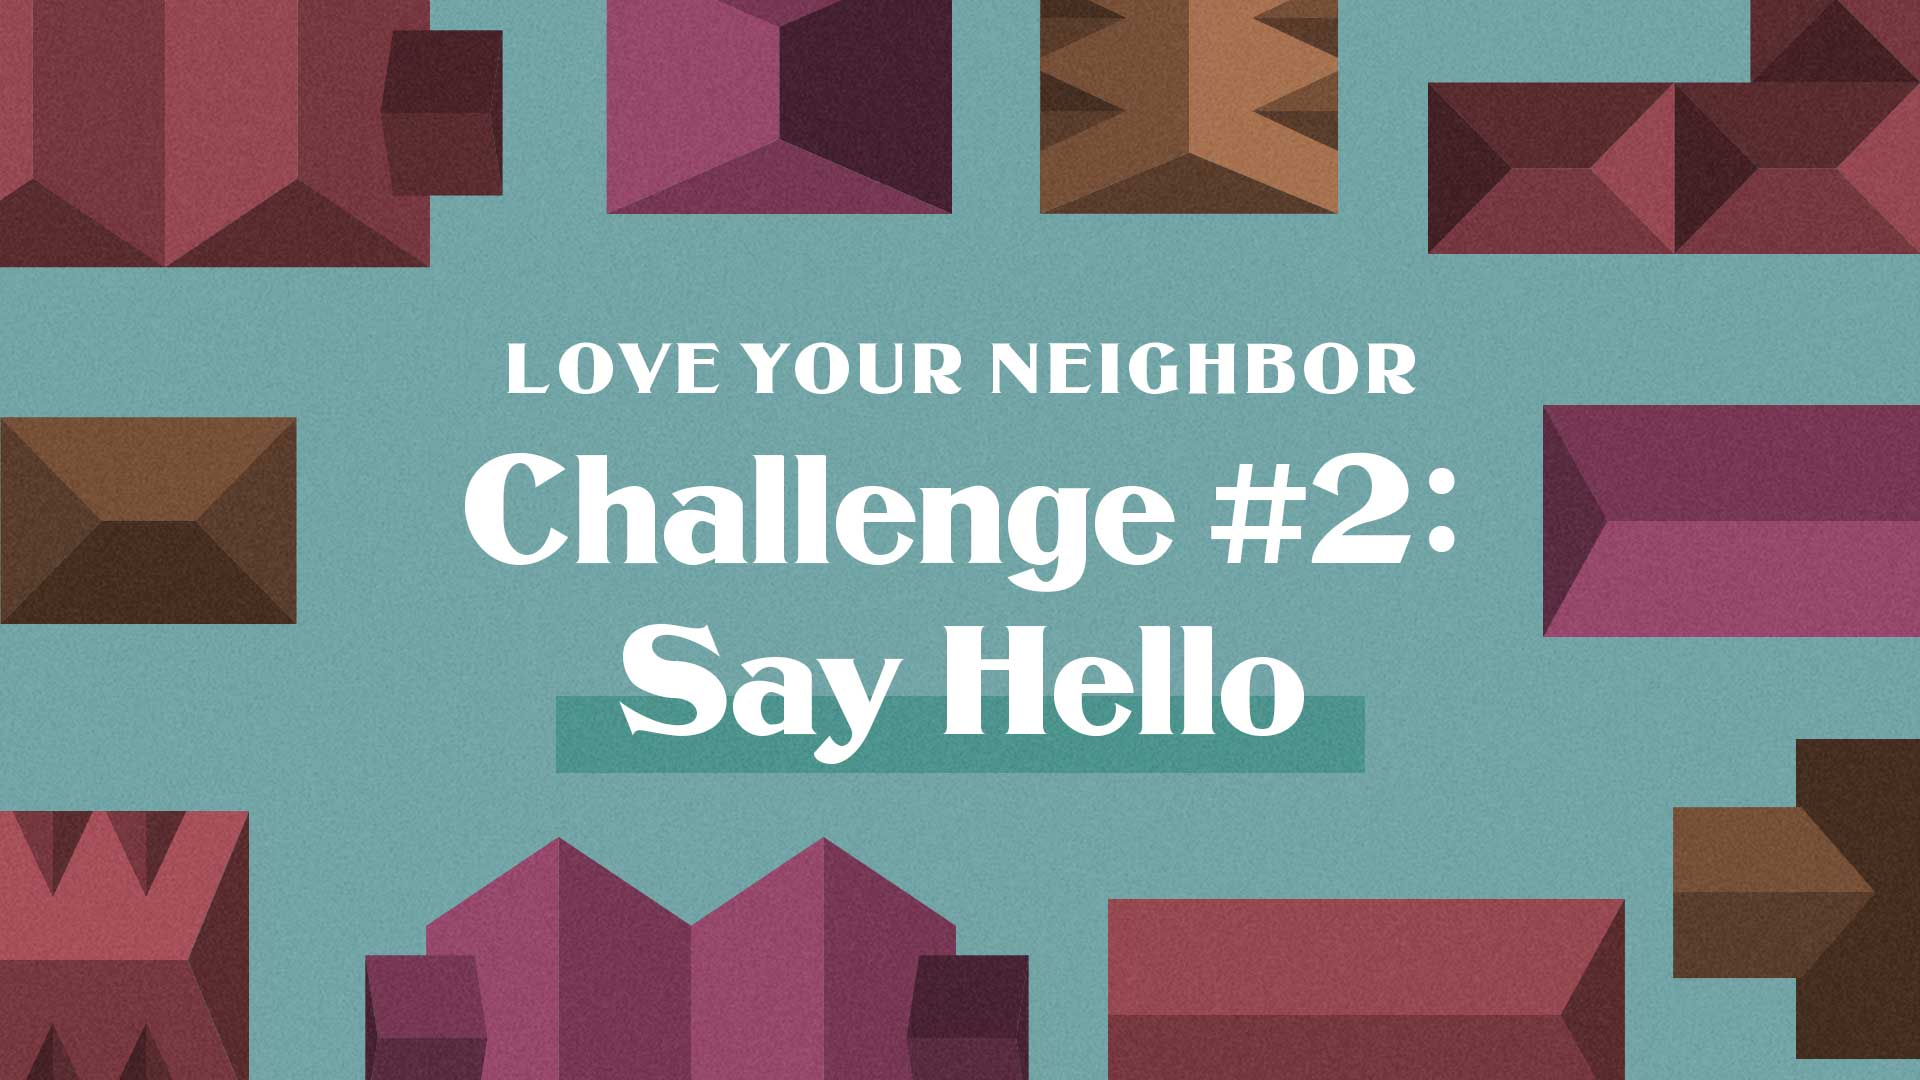 Love Your Neighbor Challenge #2